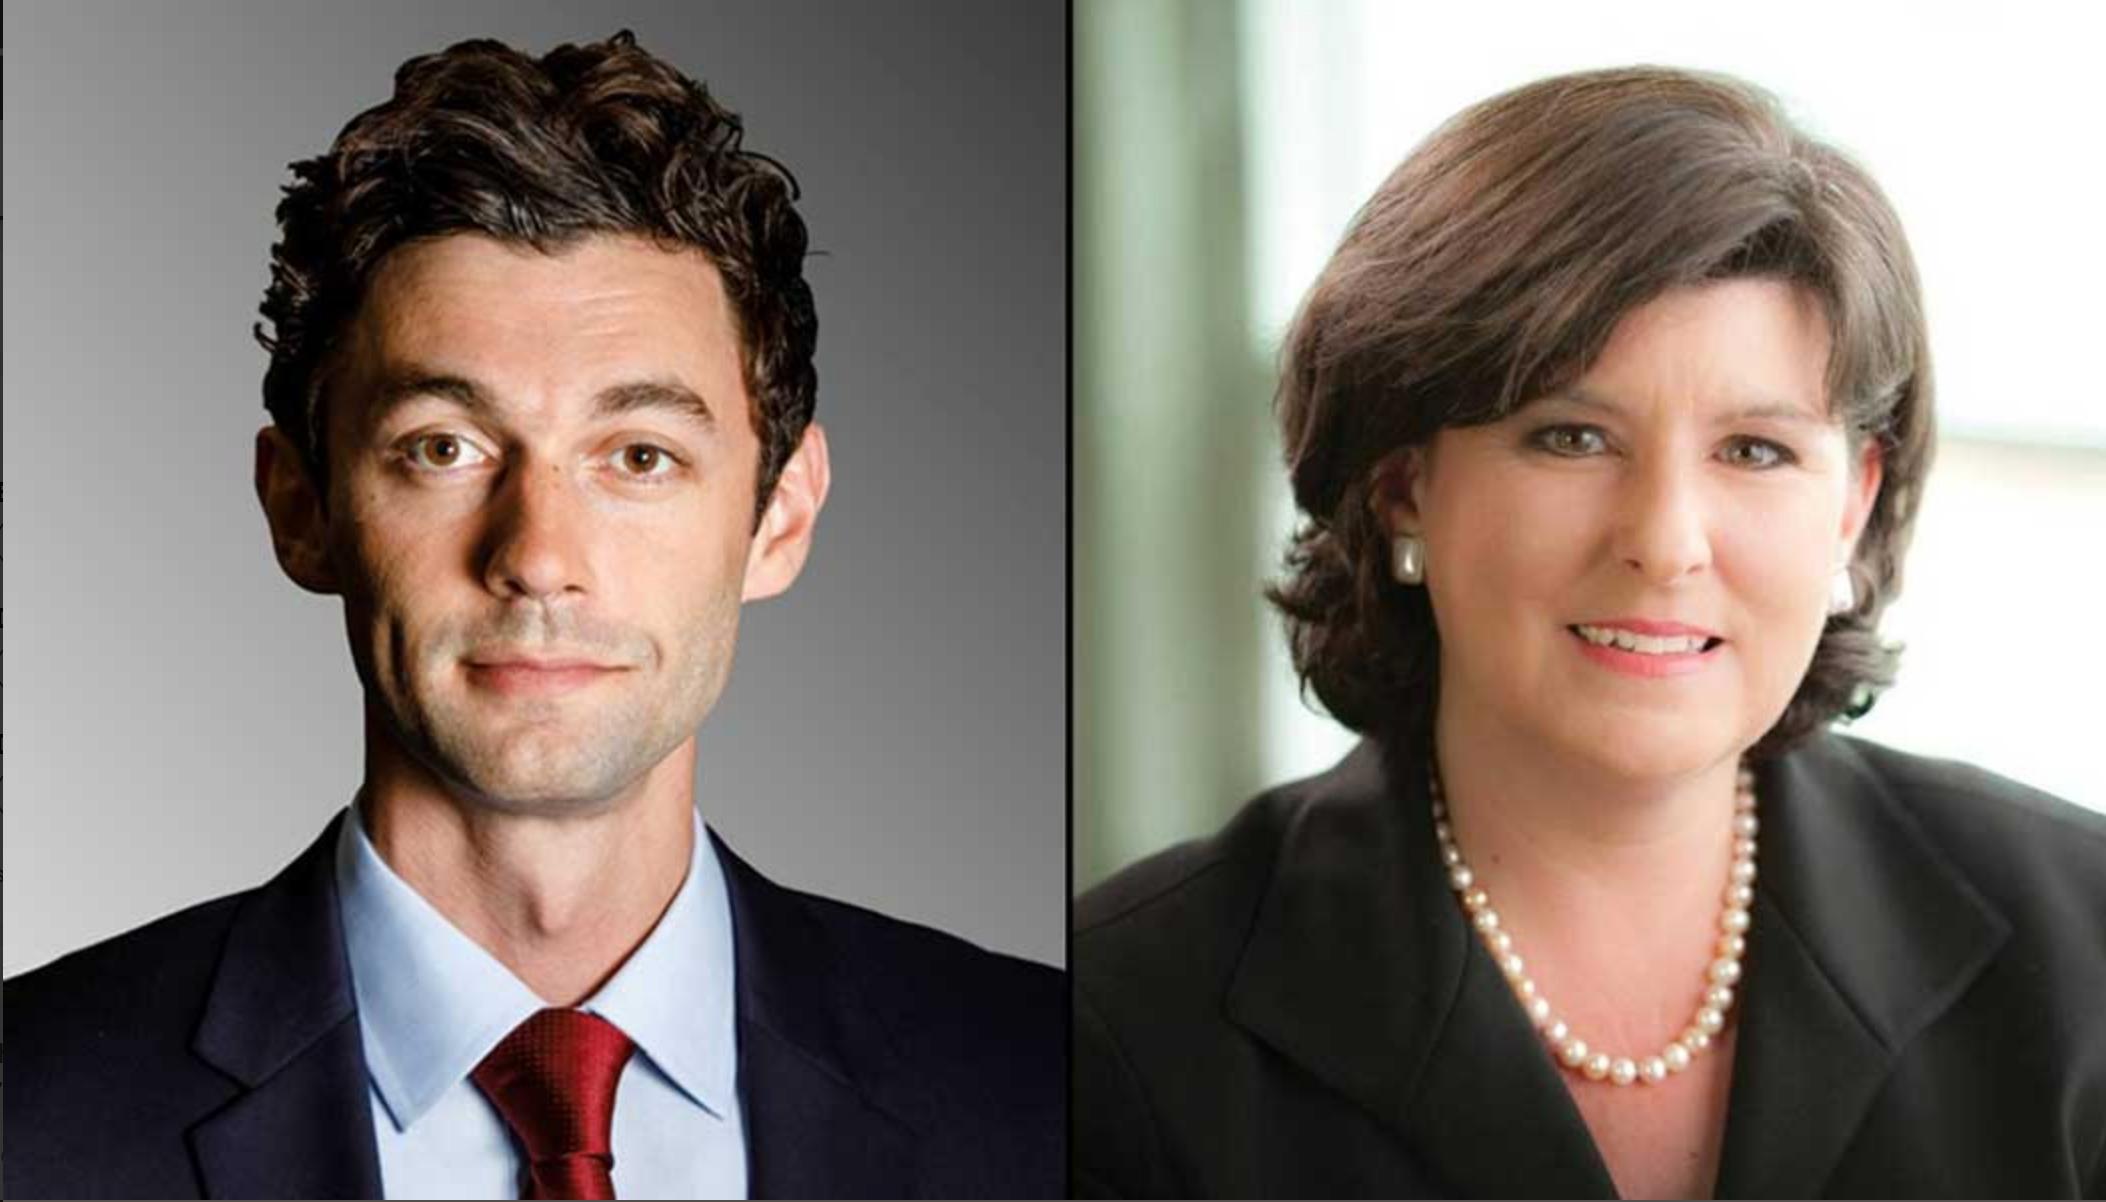 Election Day: Will #GA06 Choose Seasoned Repub Karen Handel or Wet-Behind-the-Ears Dem Jon Ossoff?